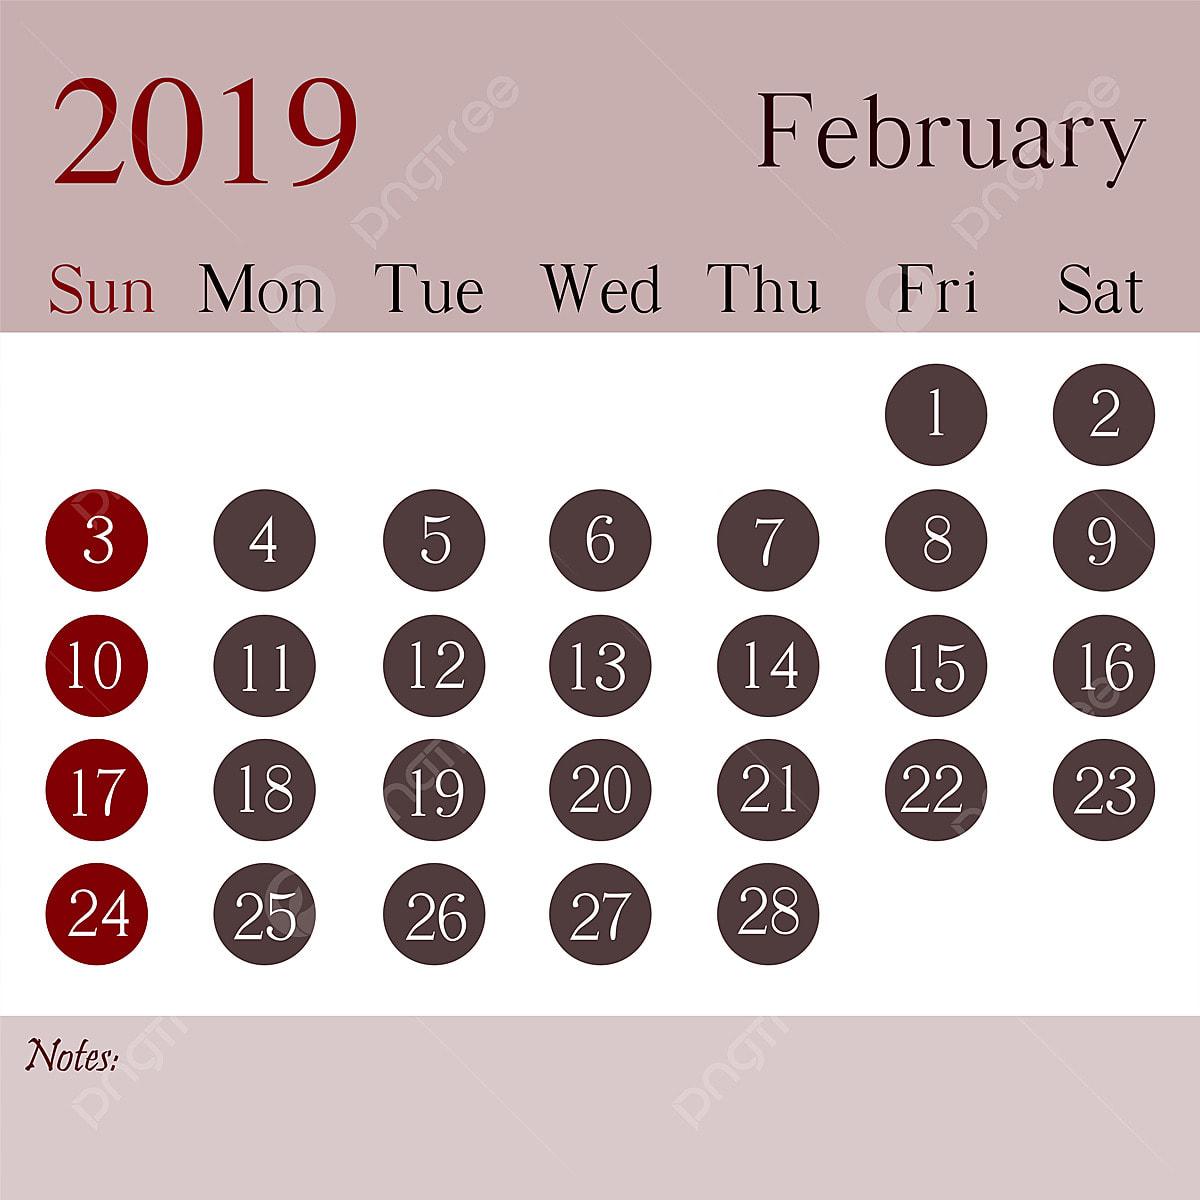 February 2019 Calendar Design Template 2019 Calendar Calendar